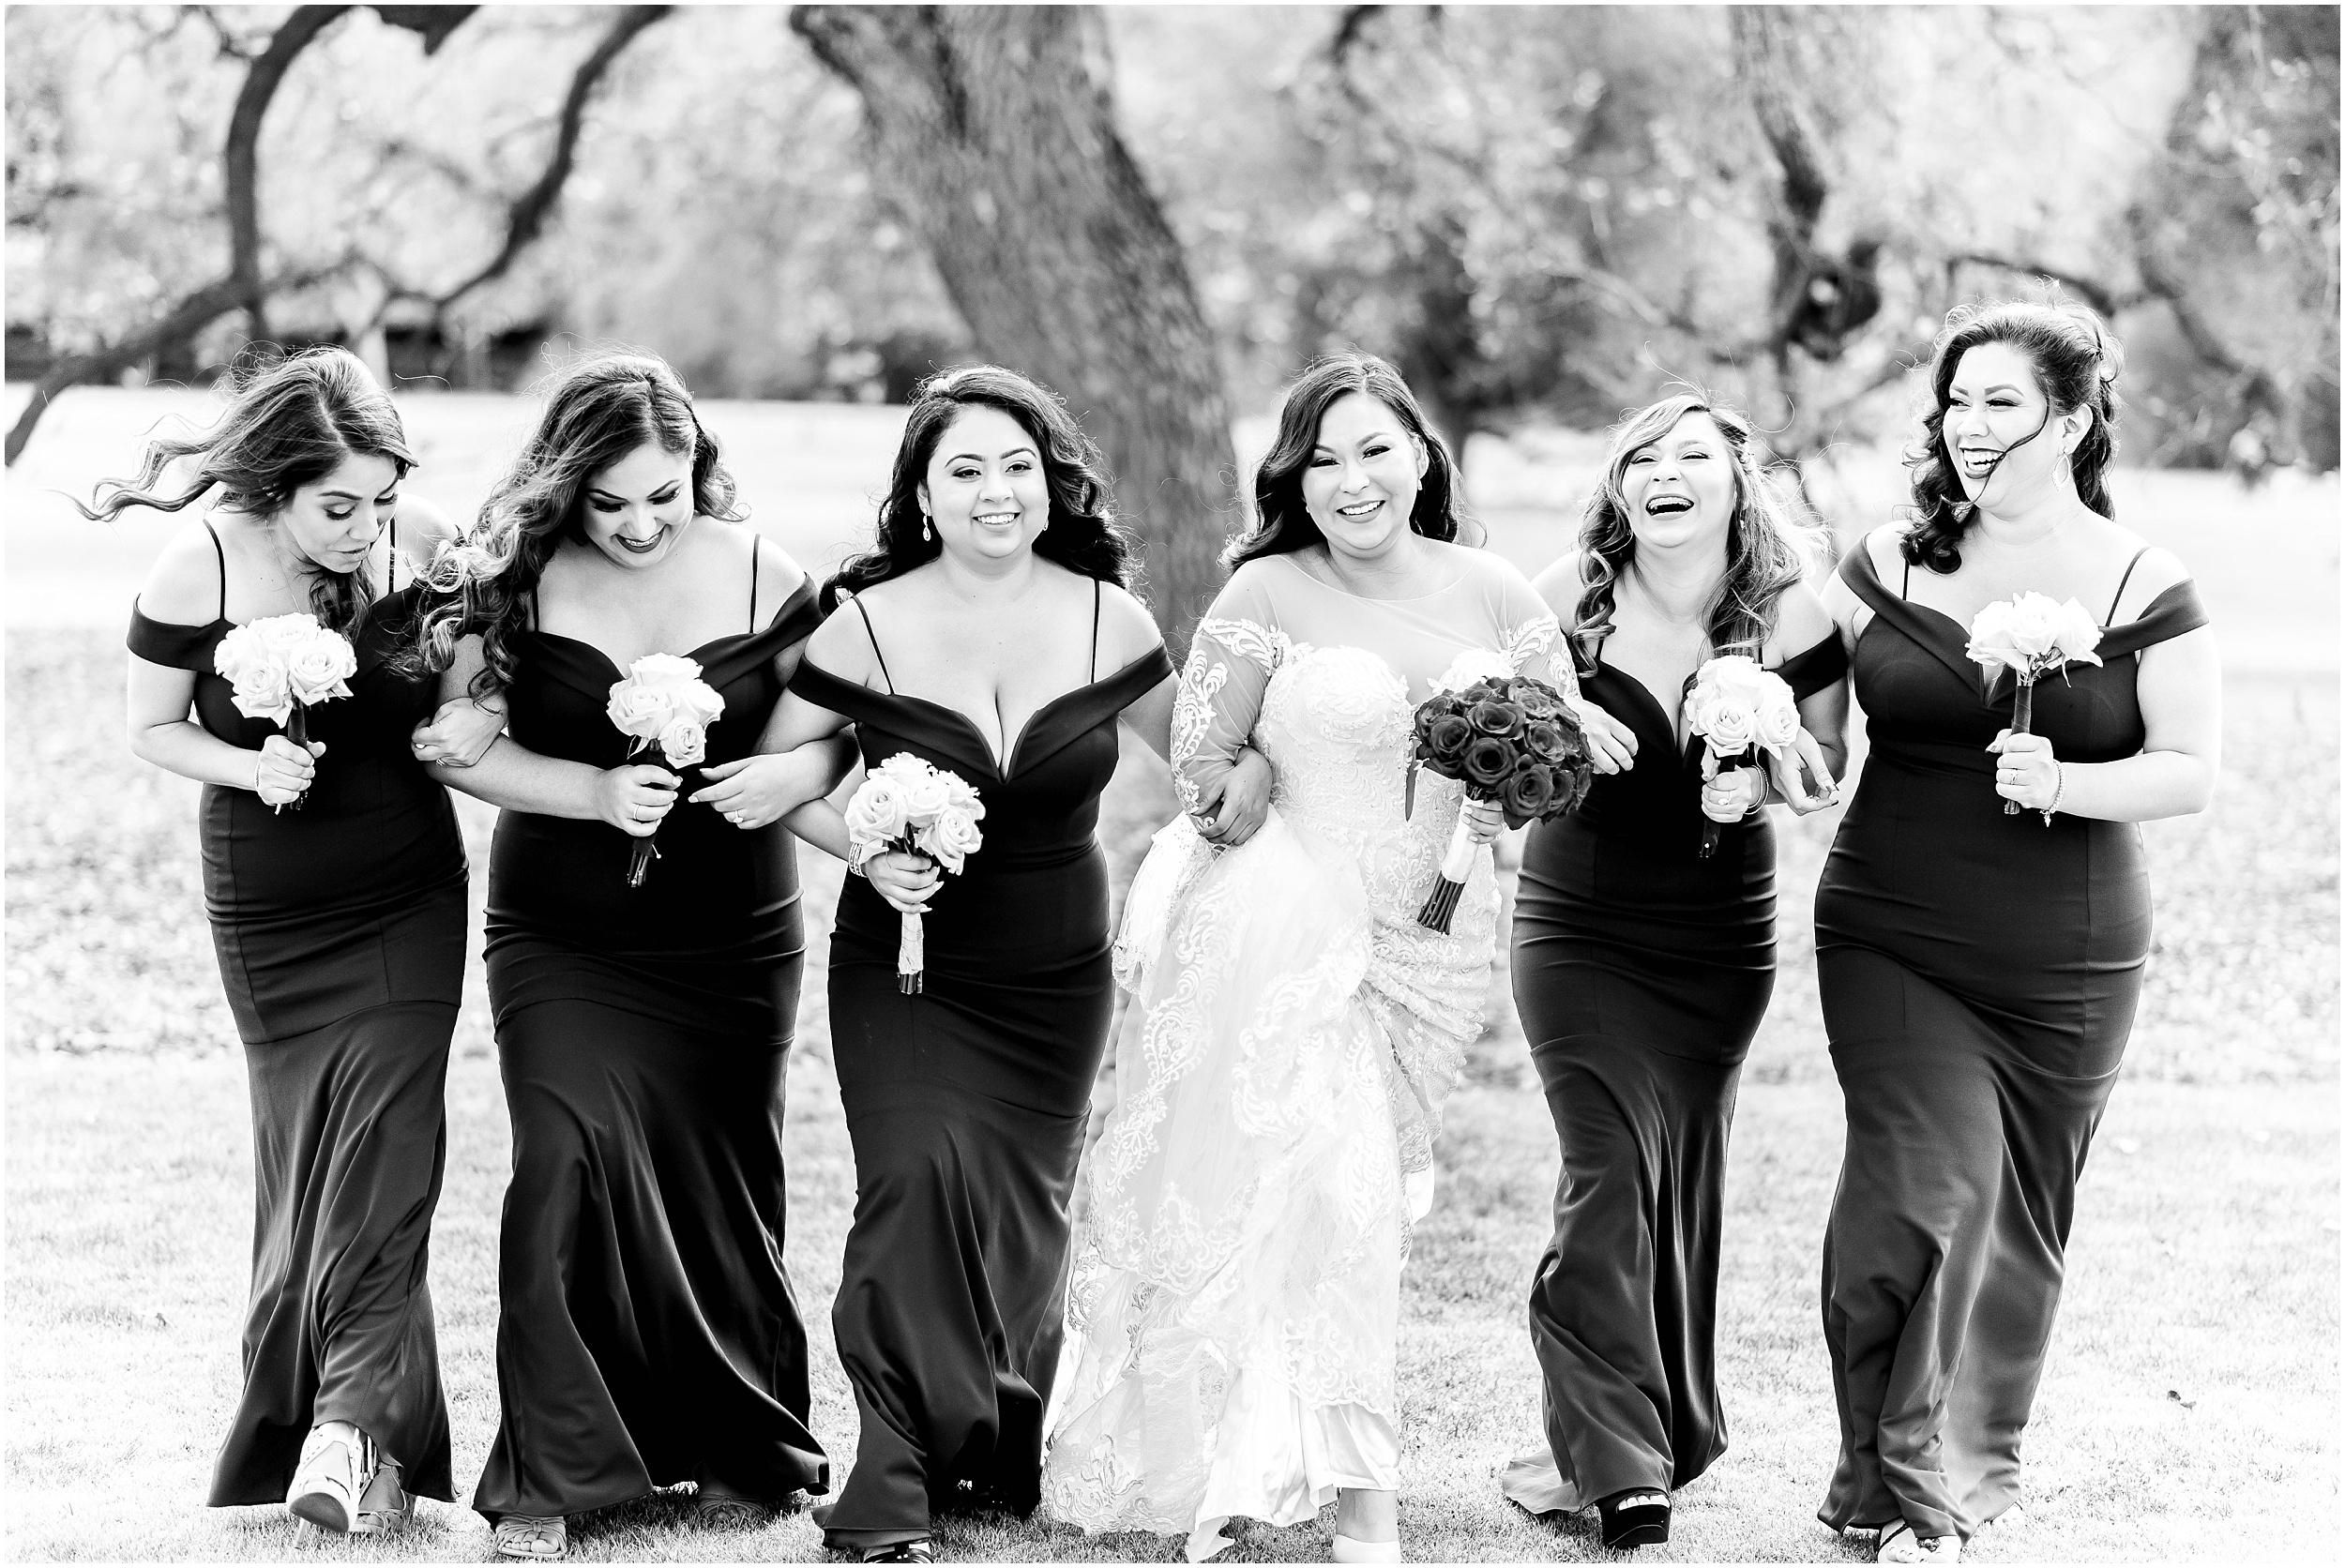 Ventura-California-and-Tallahassee-Florida-Wedding-Photographer-Crystal-and-Daniel-Wedding-at-Westlake-California_0030.jpg